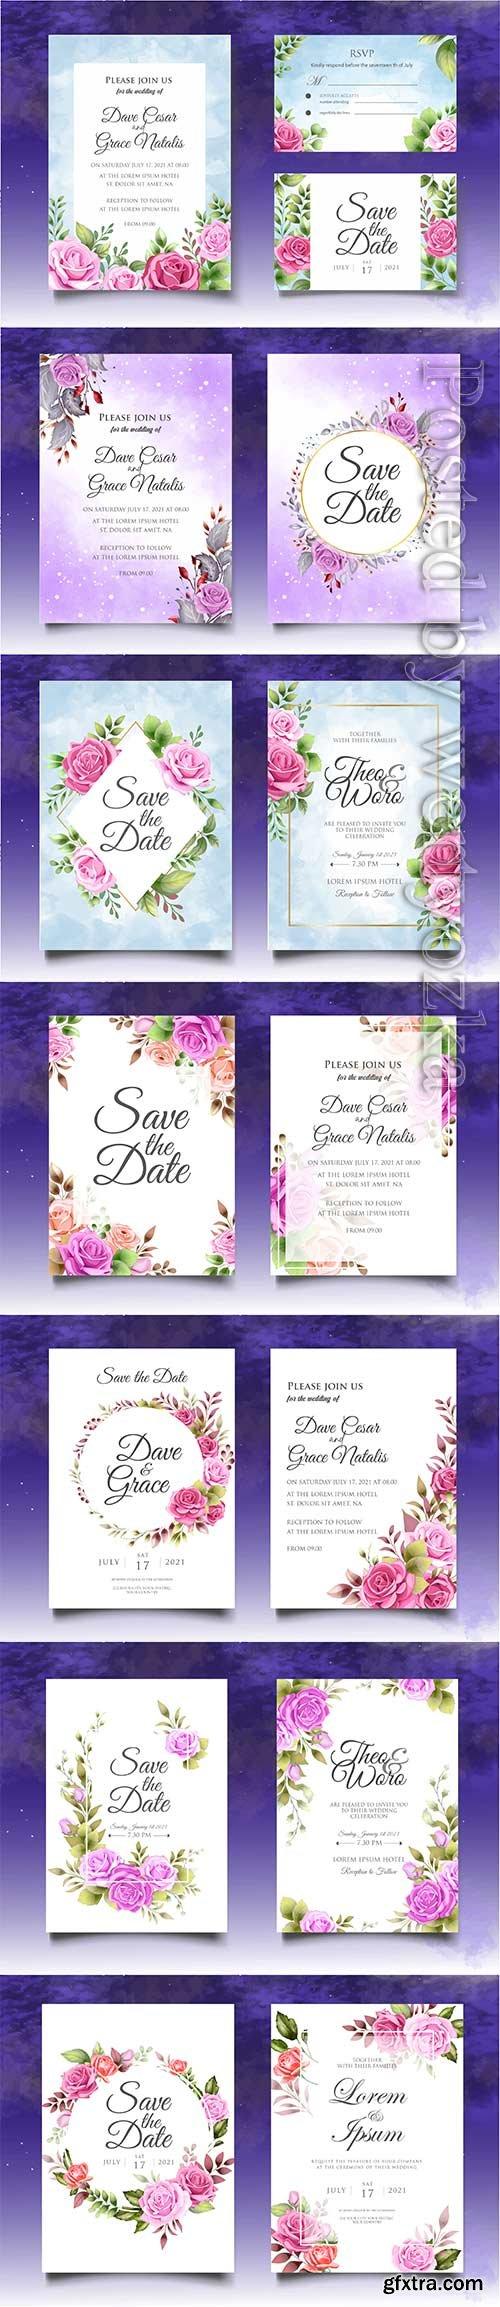 Luxury floral wedding invitation vector template